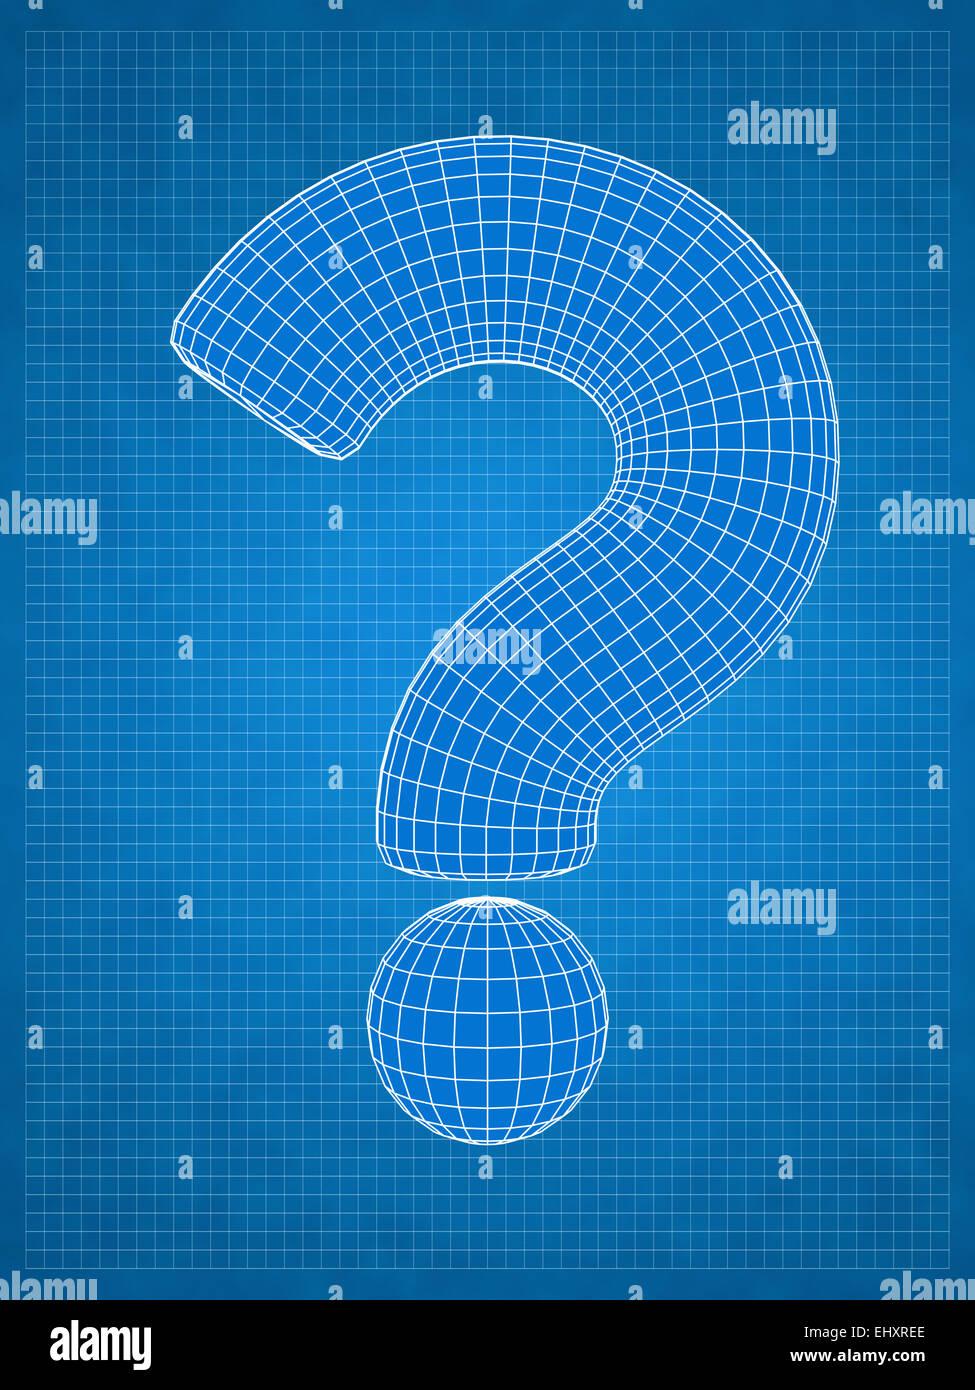 Blueprint question mark idea concept stock photo royalty free blueprint question mark idea concept malvernweather Choice Image